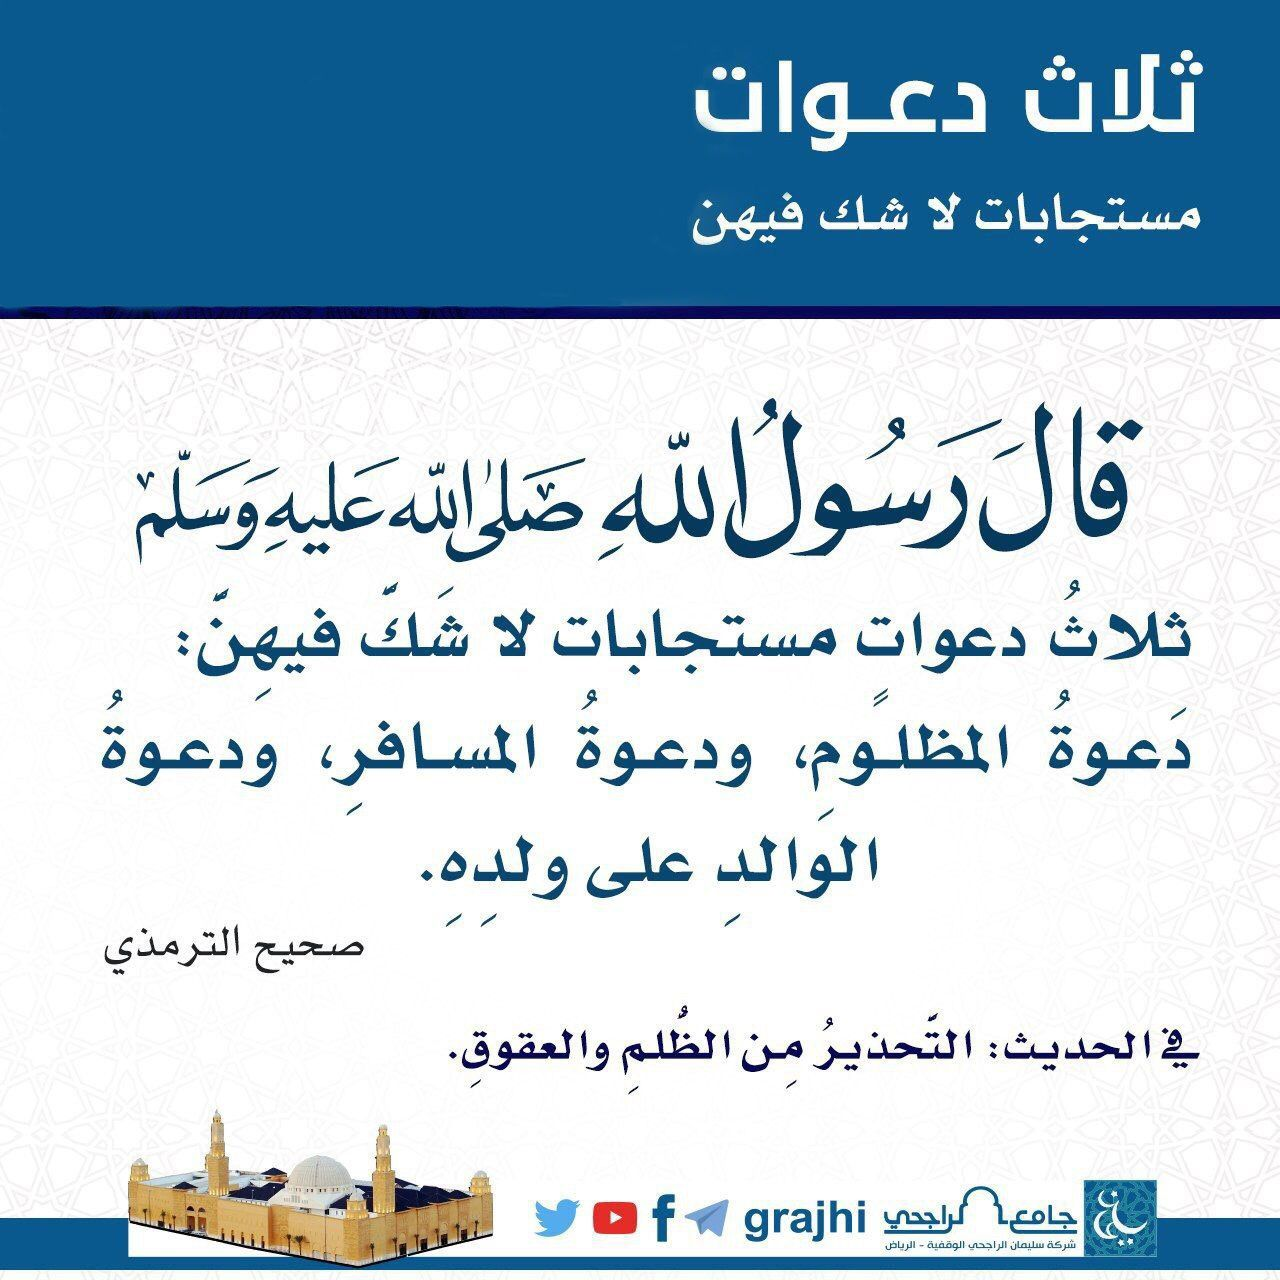 Pin By نشر الخير On أحاديث سيدنا محمد صلى الله عليه وسلم Hadith Islamic Calligraphy Islam